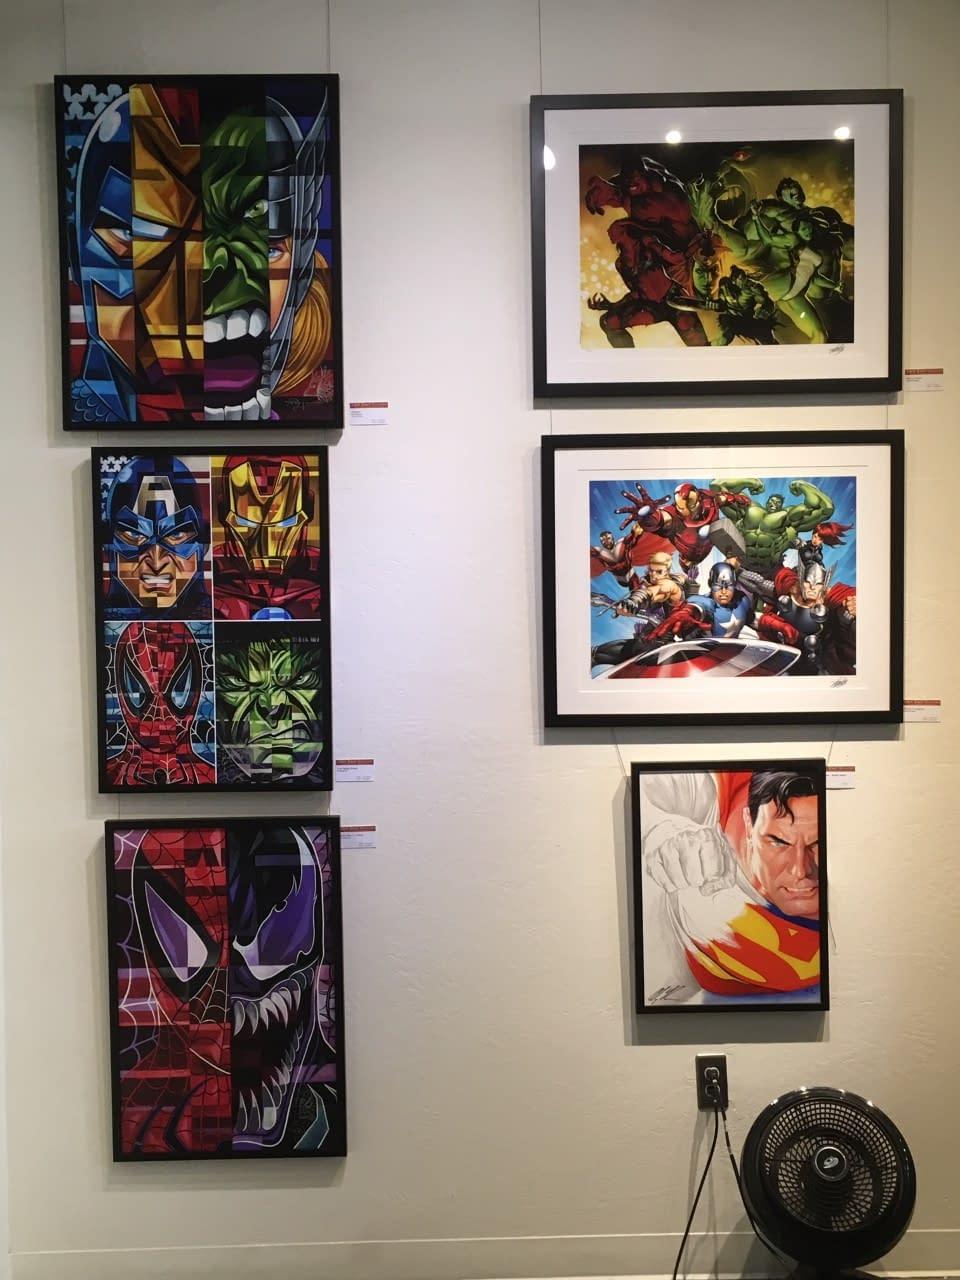 Bleeding Cool Checks Out The Chuck Jones Gallery at San Diego Comic-Con